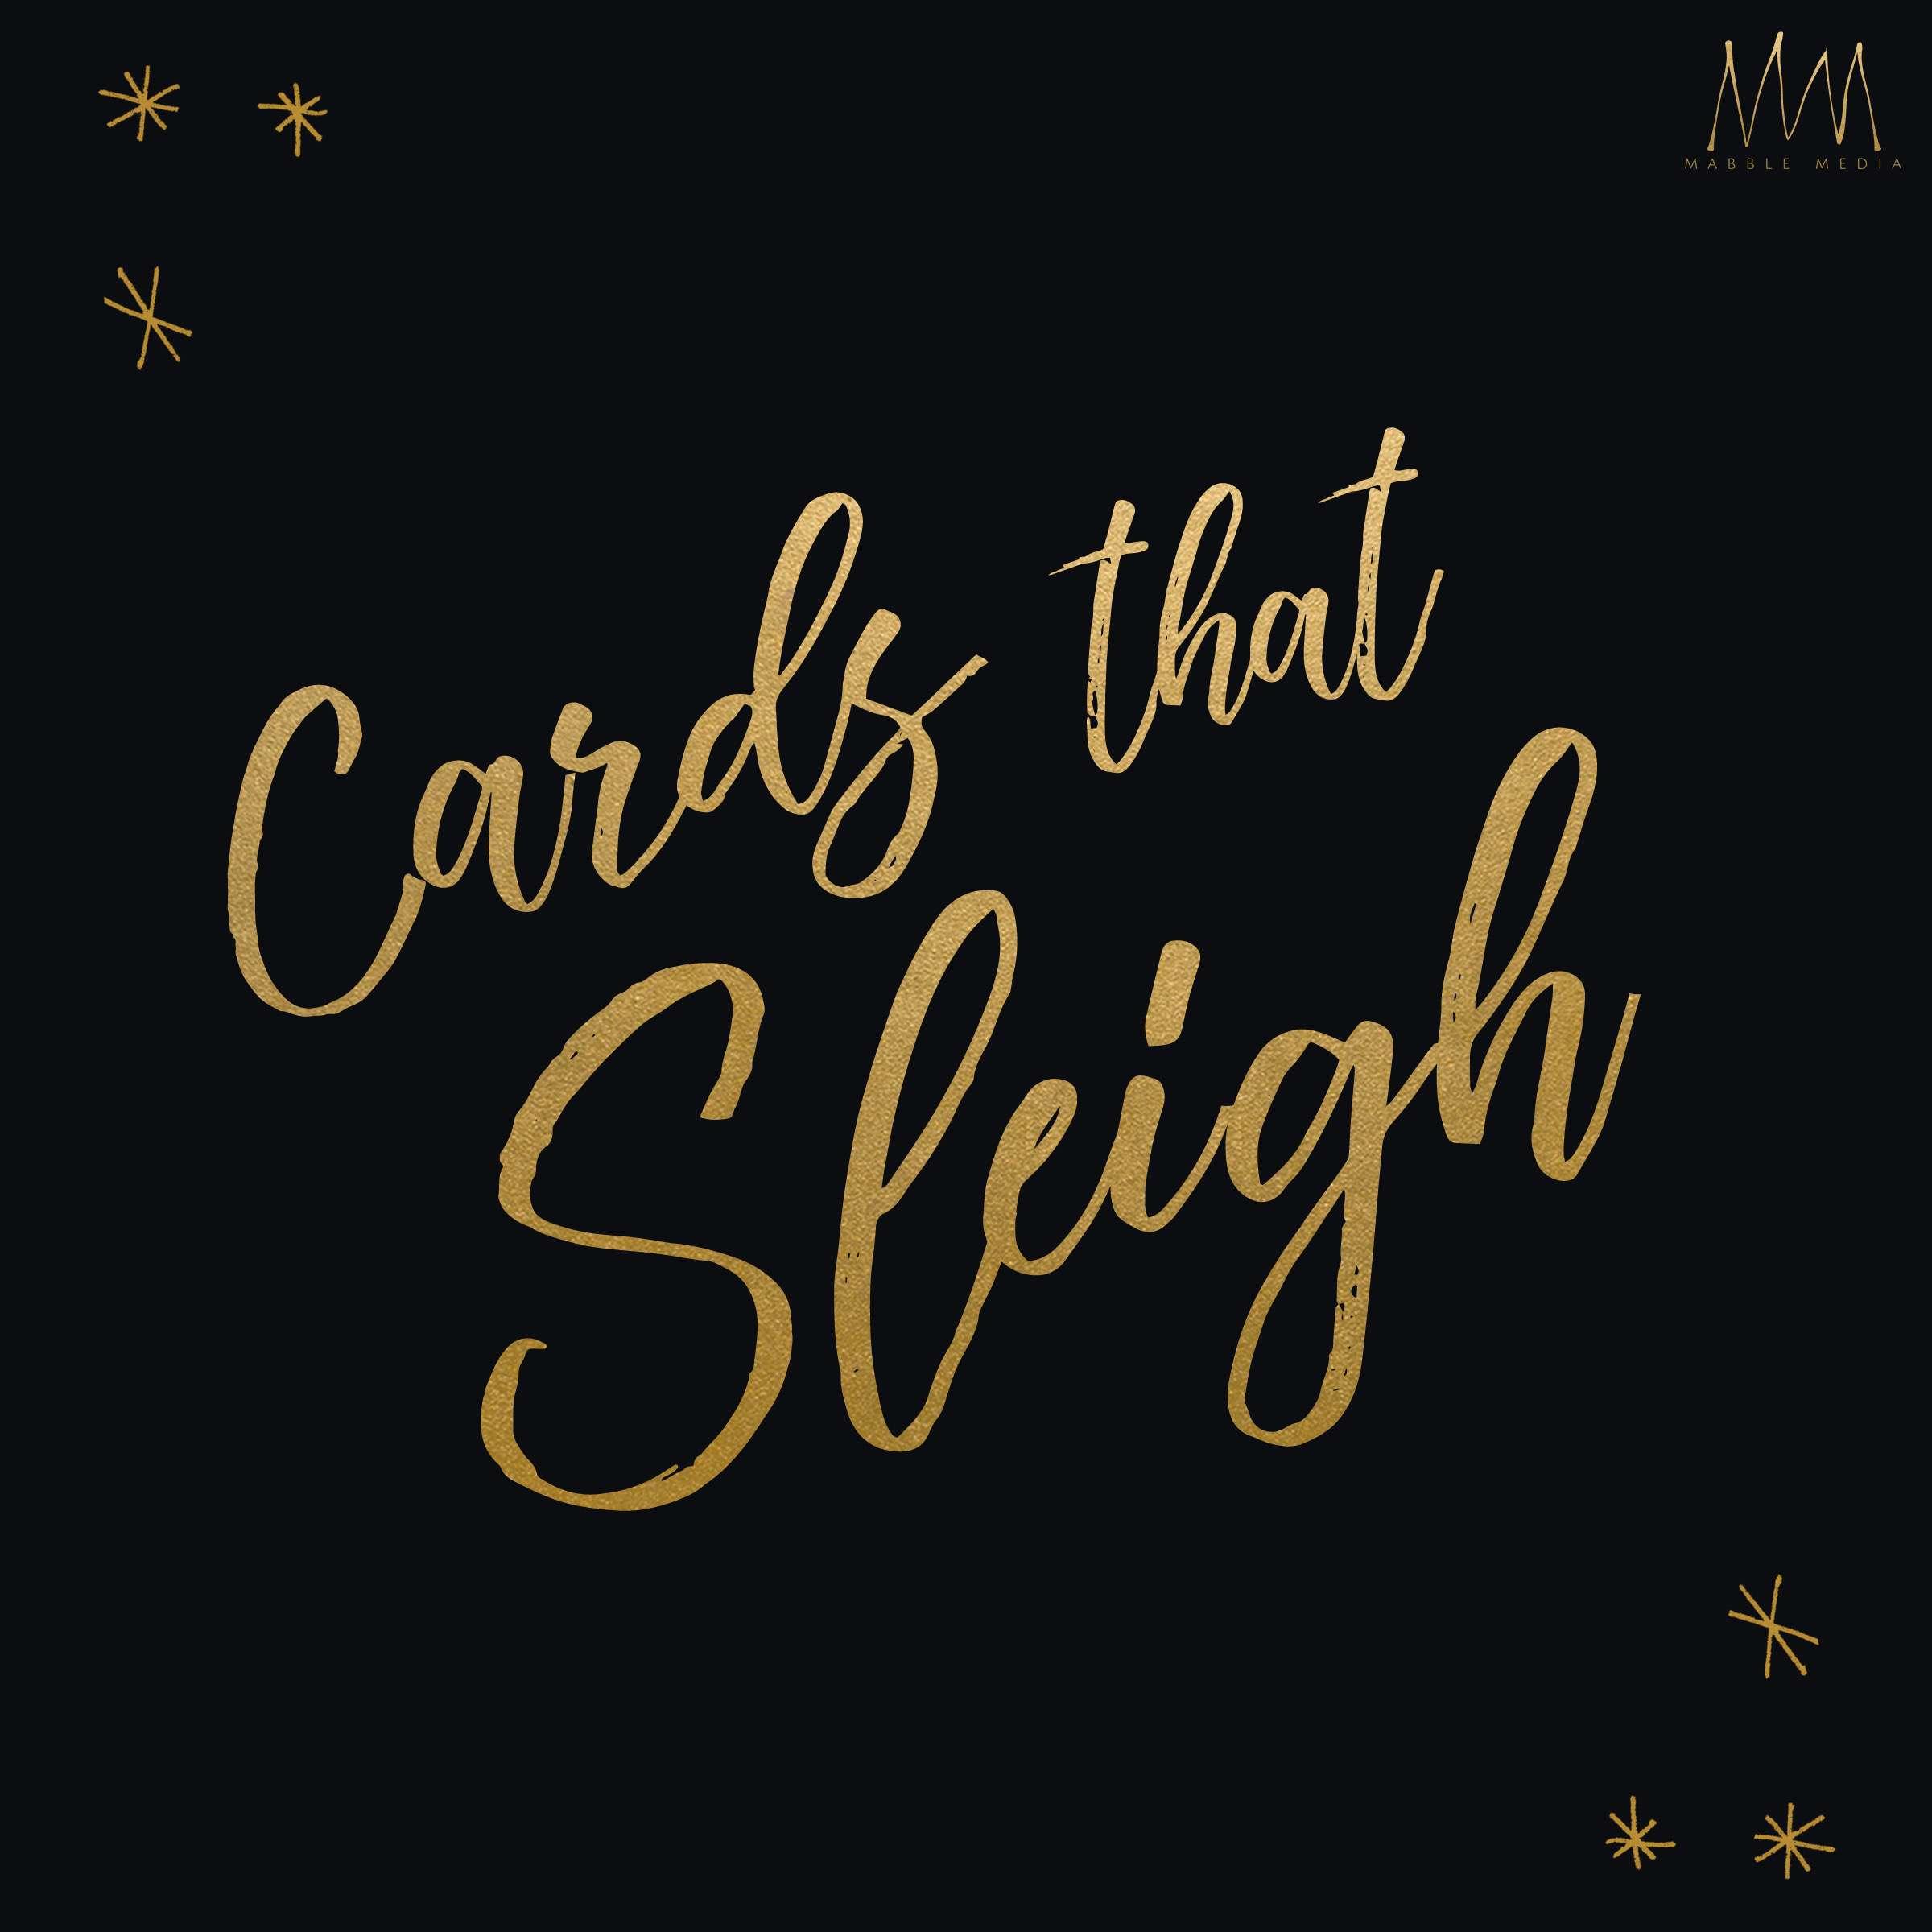 cards that sleigh reno christmas card design